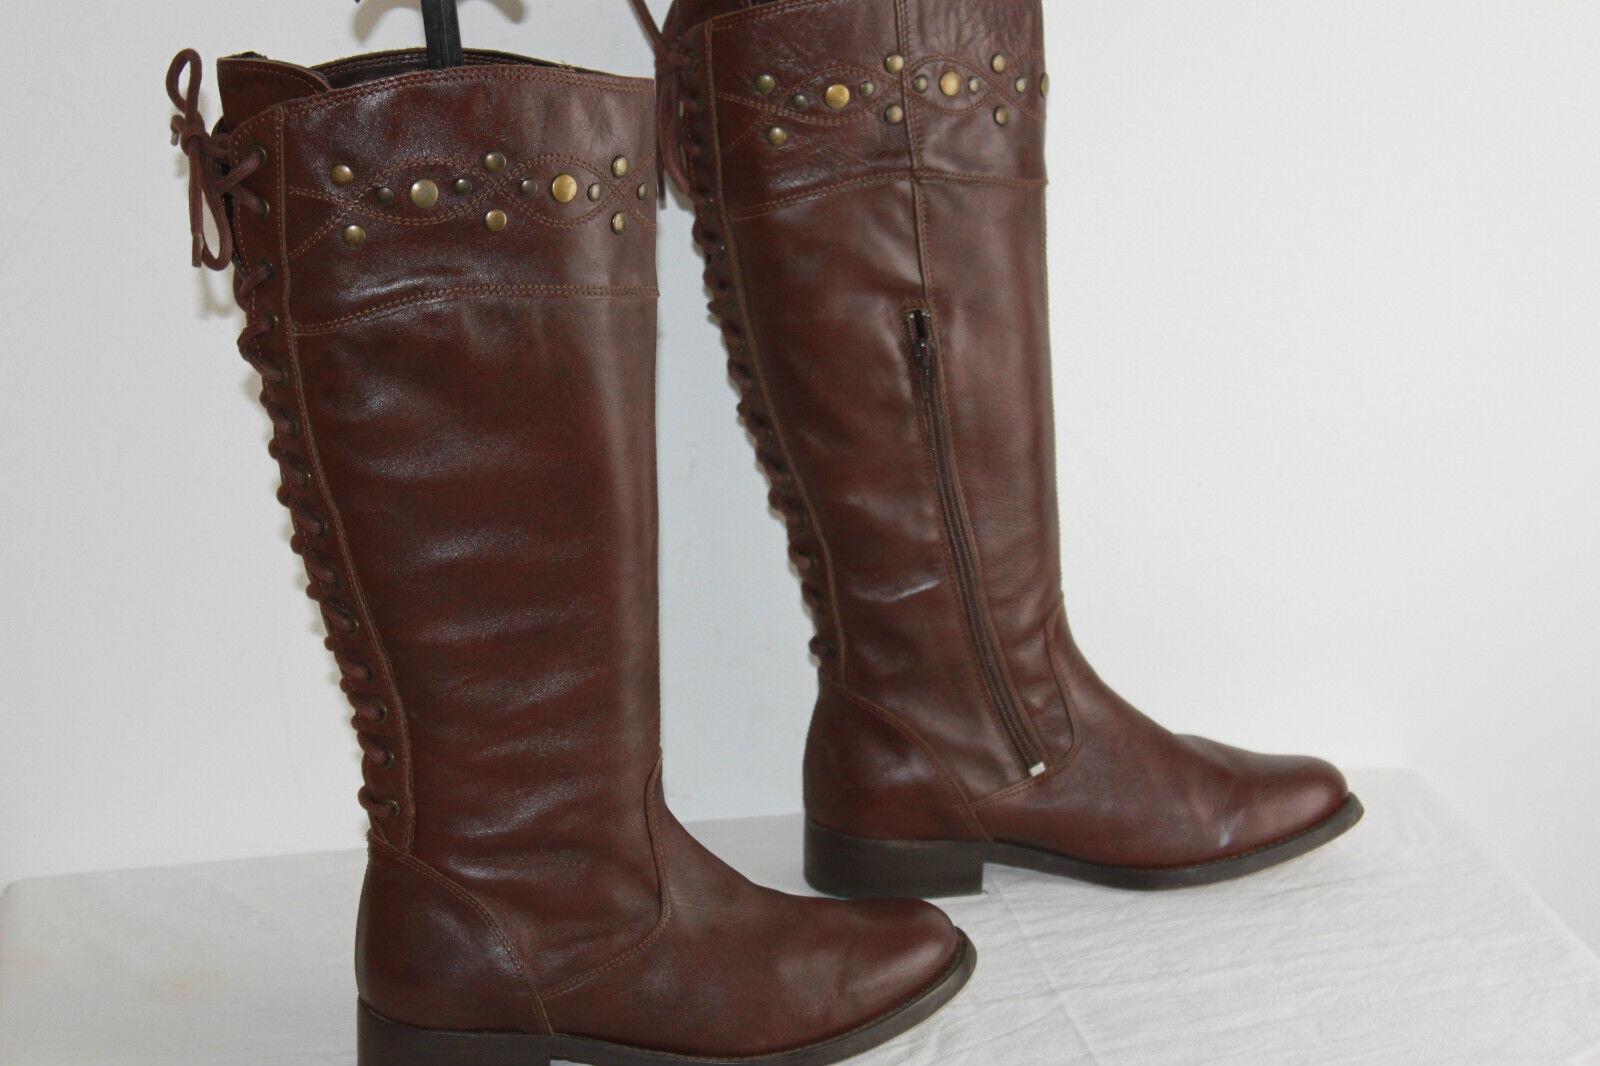 Boots 3 3 SUISSES Leather Cognac T 38 TOP CONDITION